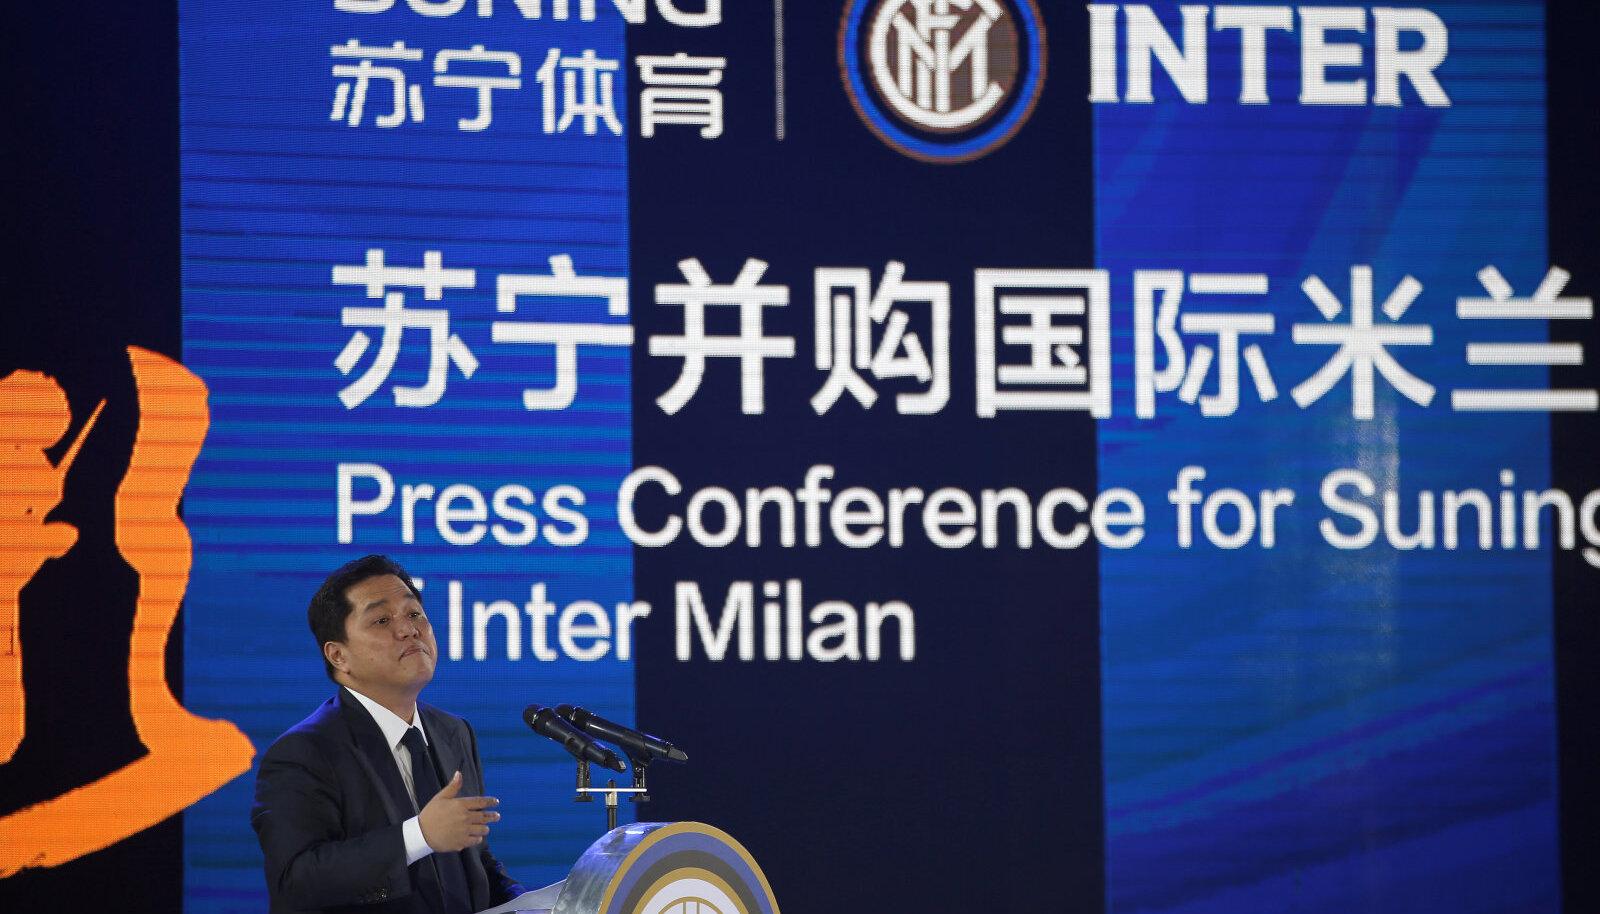 Inter Milani tänane pressikonverents Hiinas Nanjingis